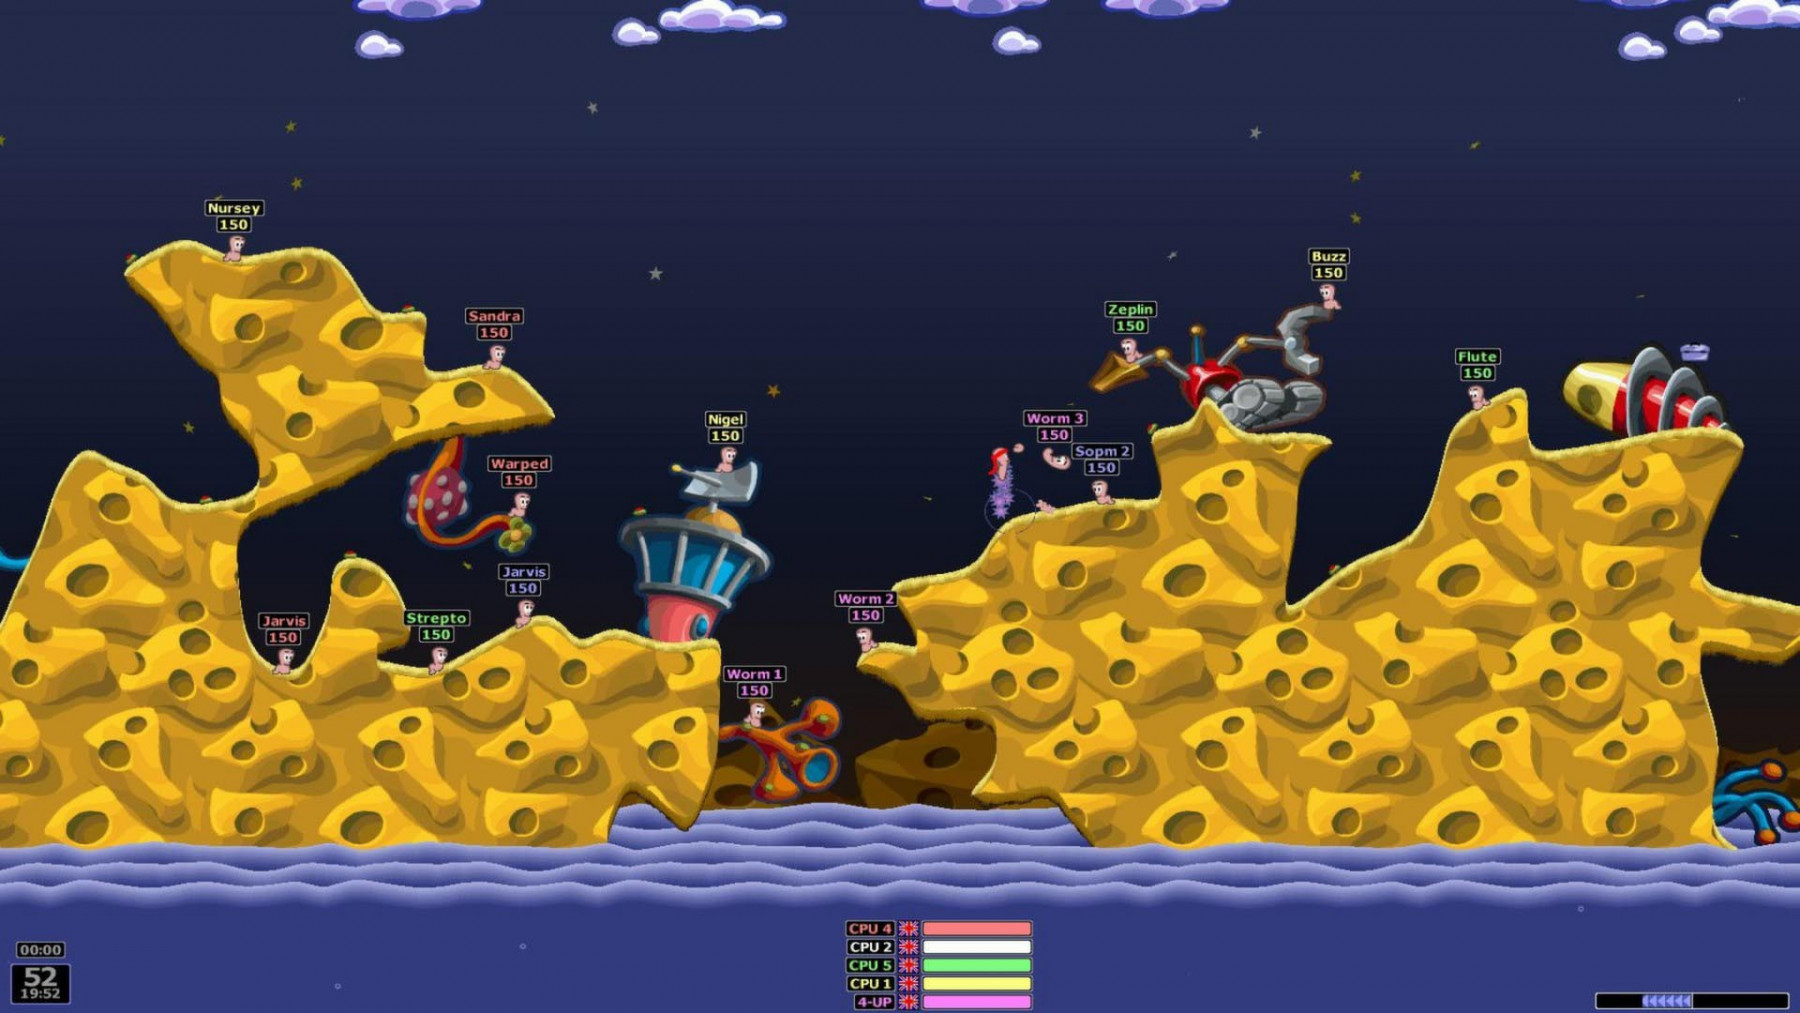 Video game developer reveals float plans